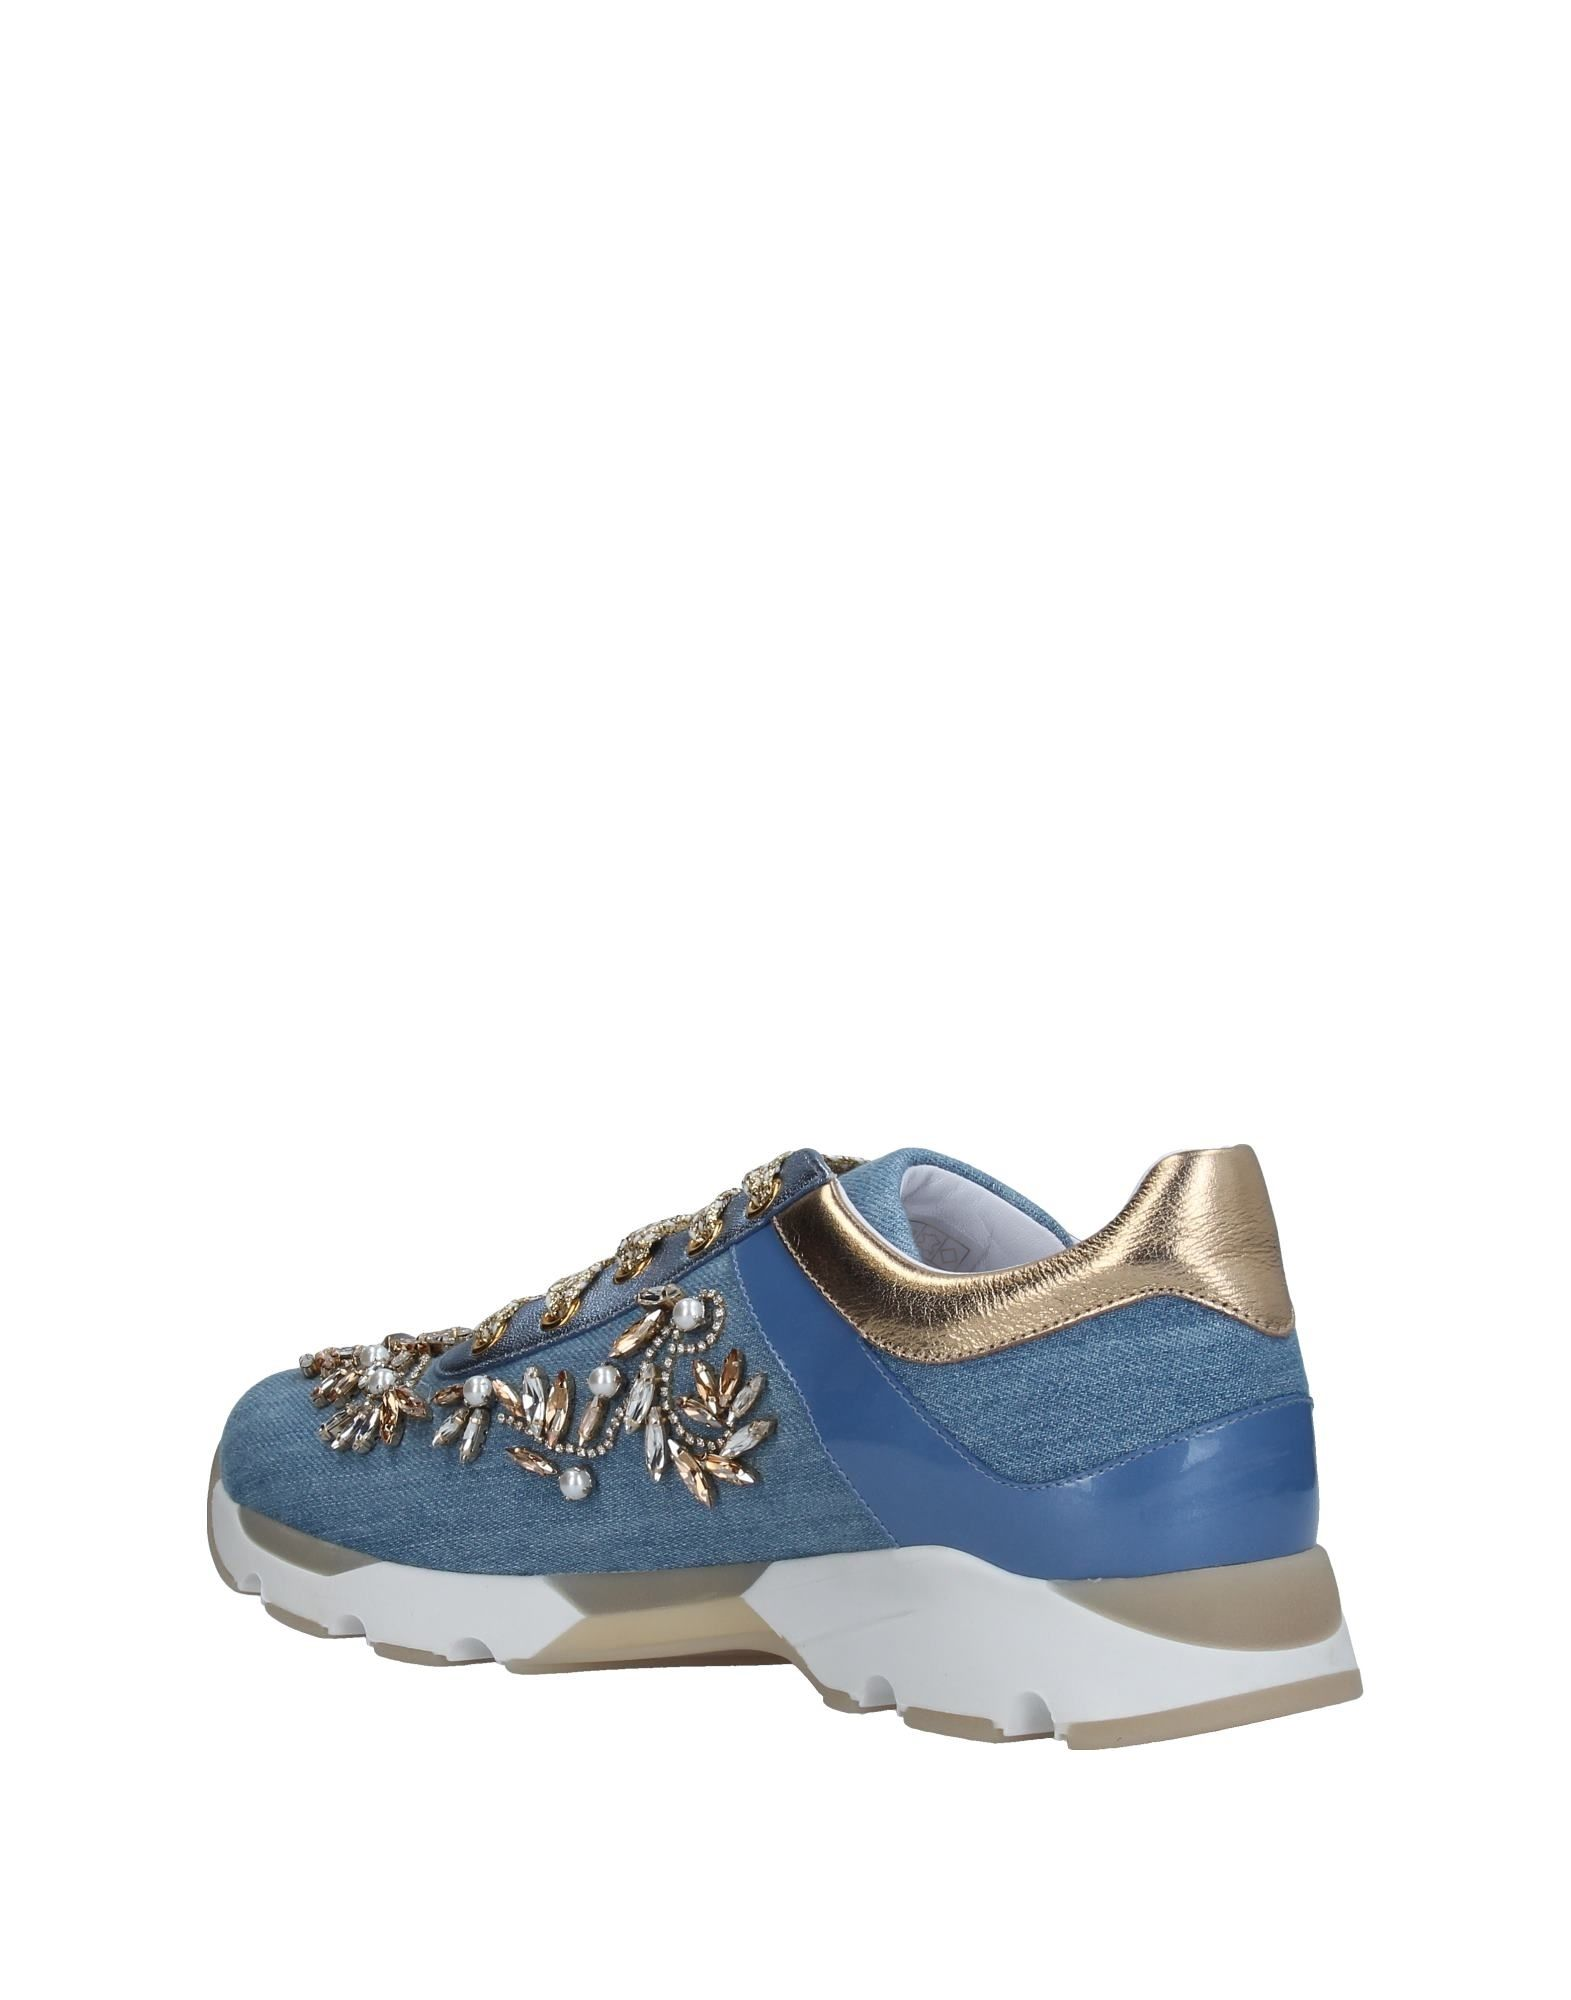 Rene' Caovilla Sneakers 11340067NC Damen  11340067NC Sneakers Neue Schuhe 95da07